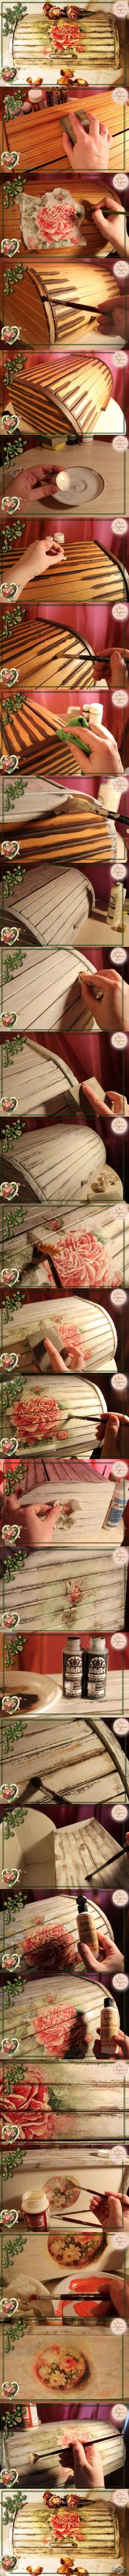 "Декупаж - Сайт любителей декупажа - DCPG.RU | Хлебница ""Осенняя роза"" от магазина Мое любимое дело Click on photo to see more! Нажмите на фото чтобы увидеть больше! decoupage art craft handmade home decor DIY do it yourself tutorial Materials and techniques: rice paper napkin varnish mod podge craquelure paint etc."